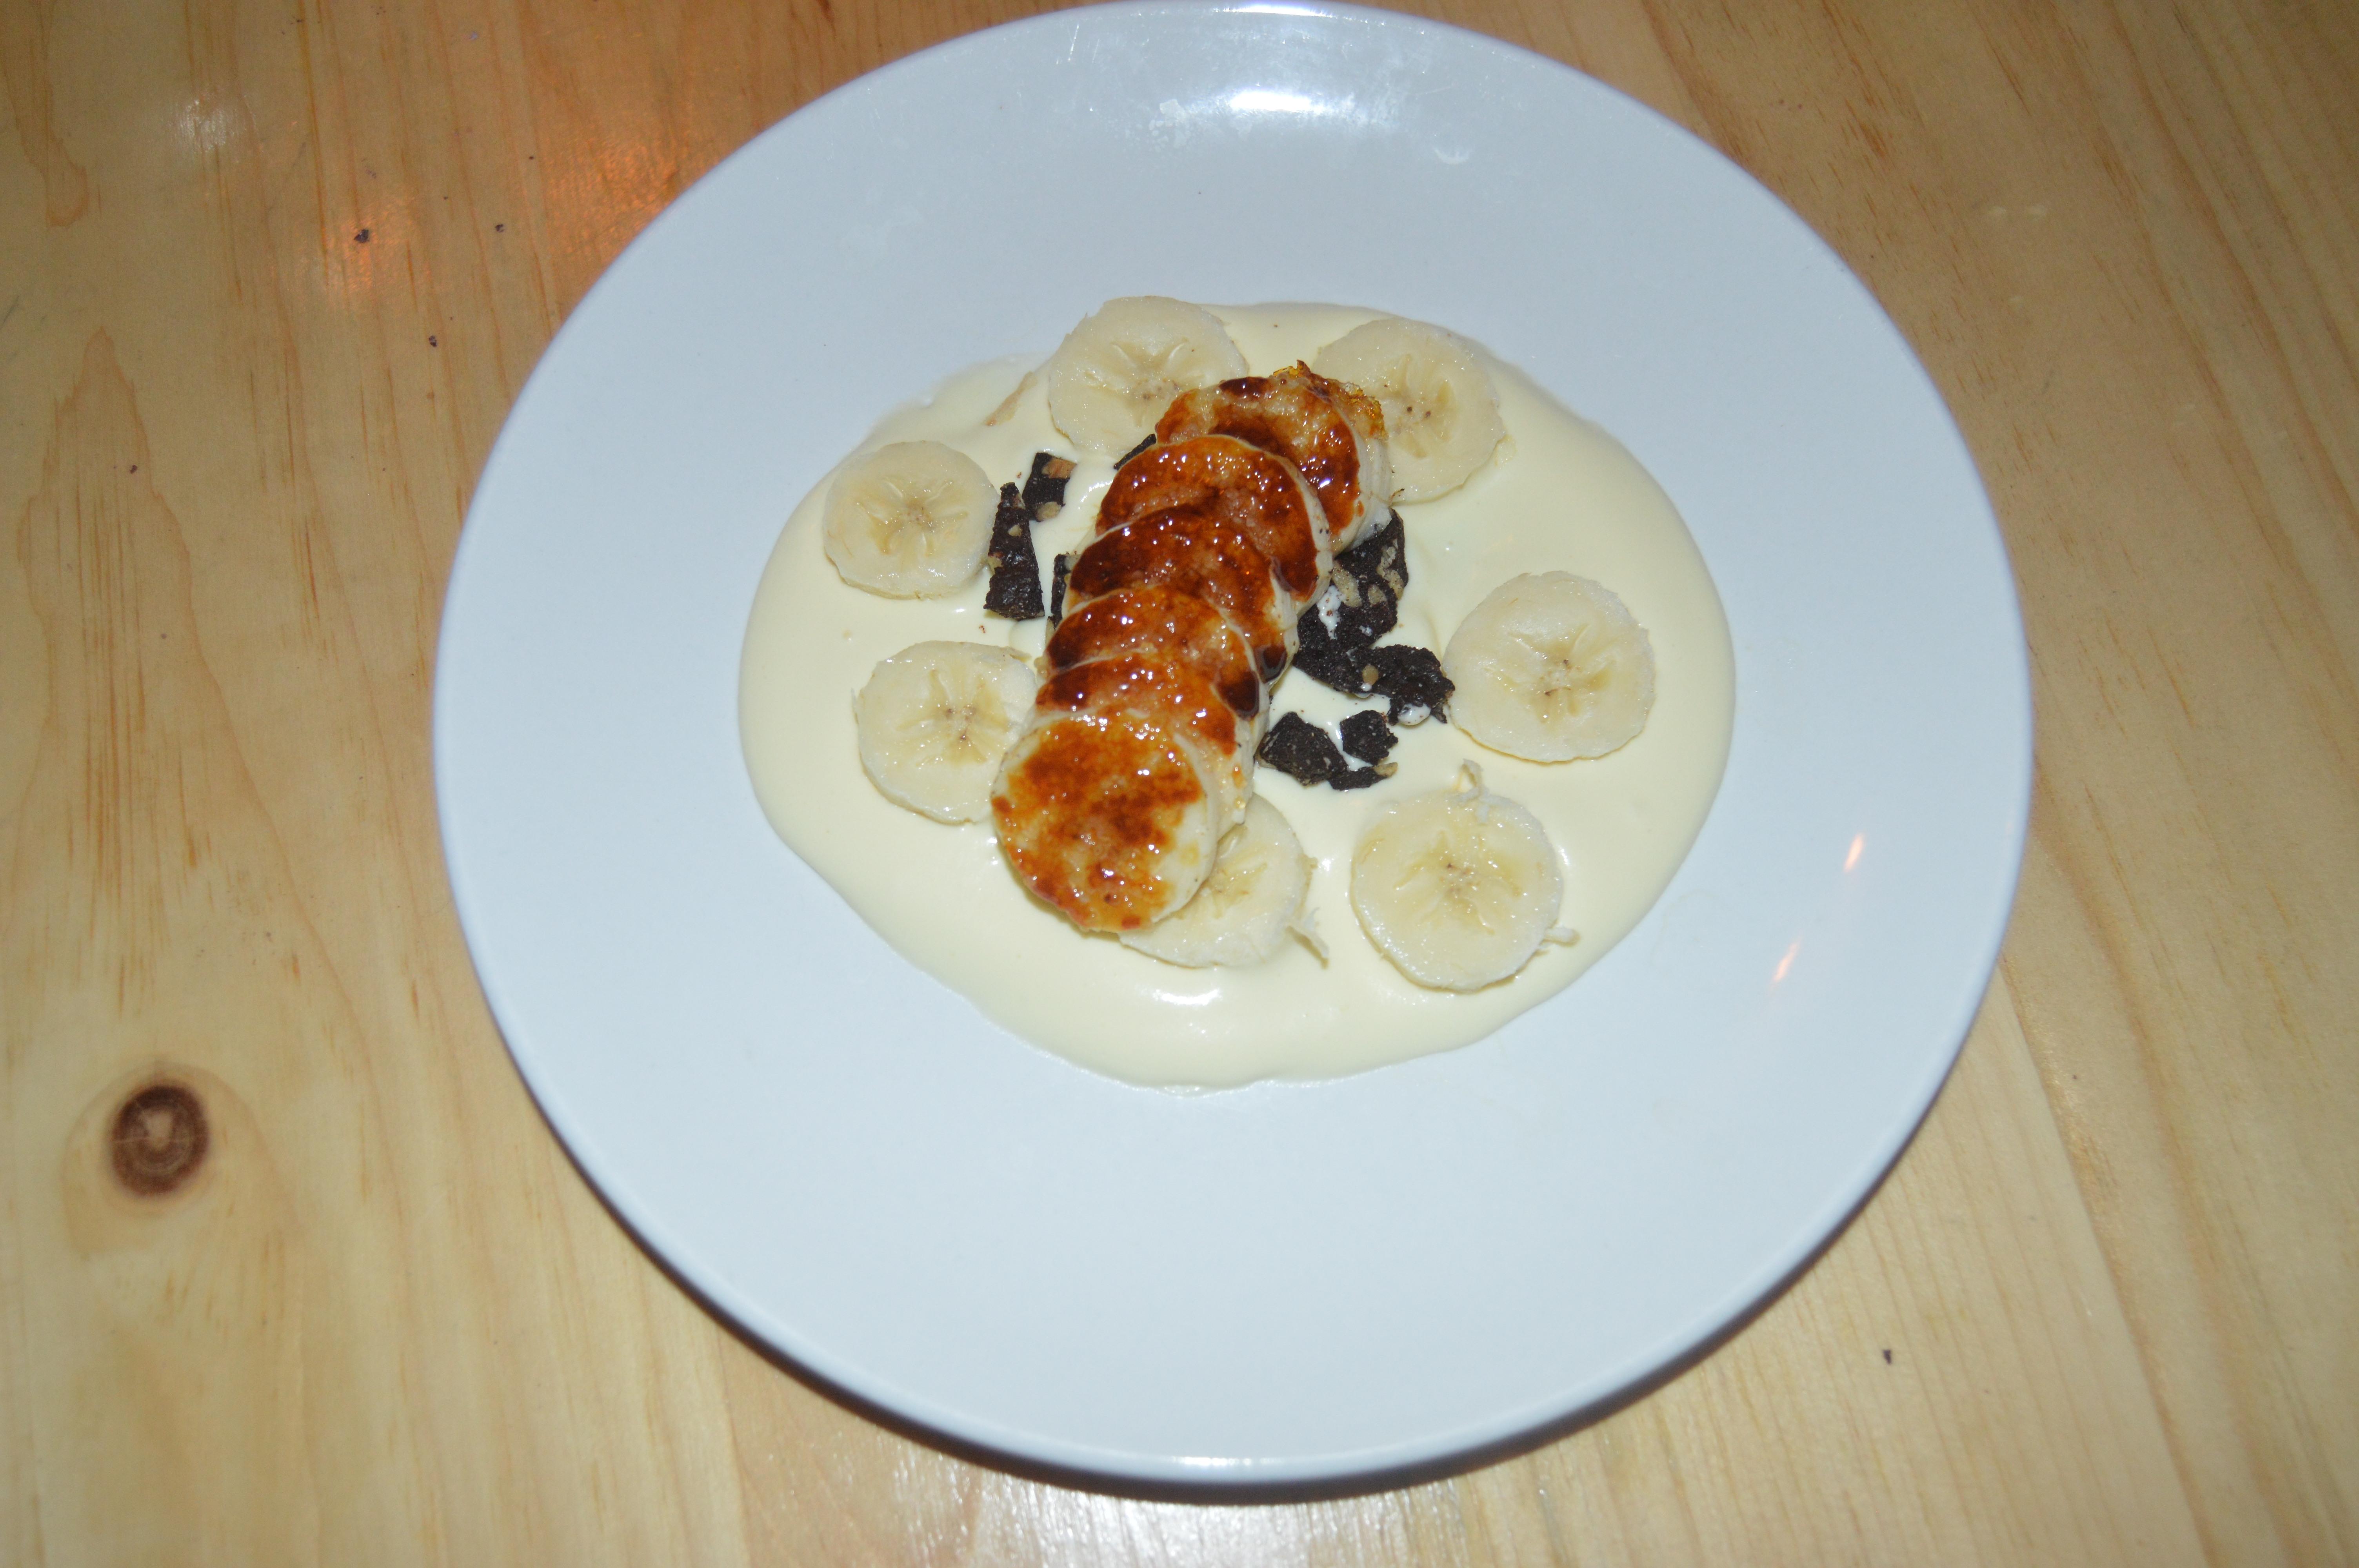 d44a688d312522fbb797_Carmelized_banana_pudding.JPG